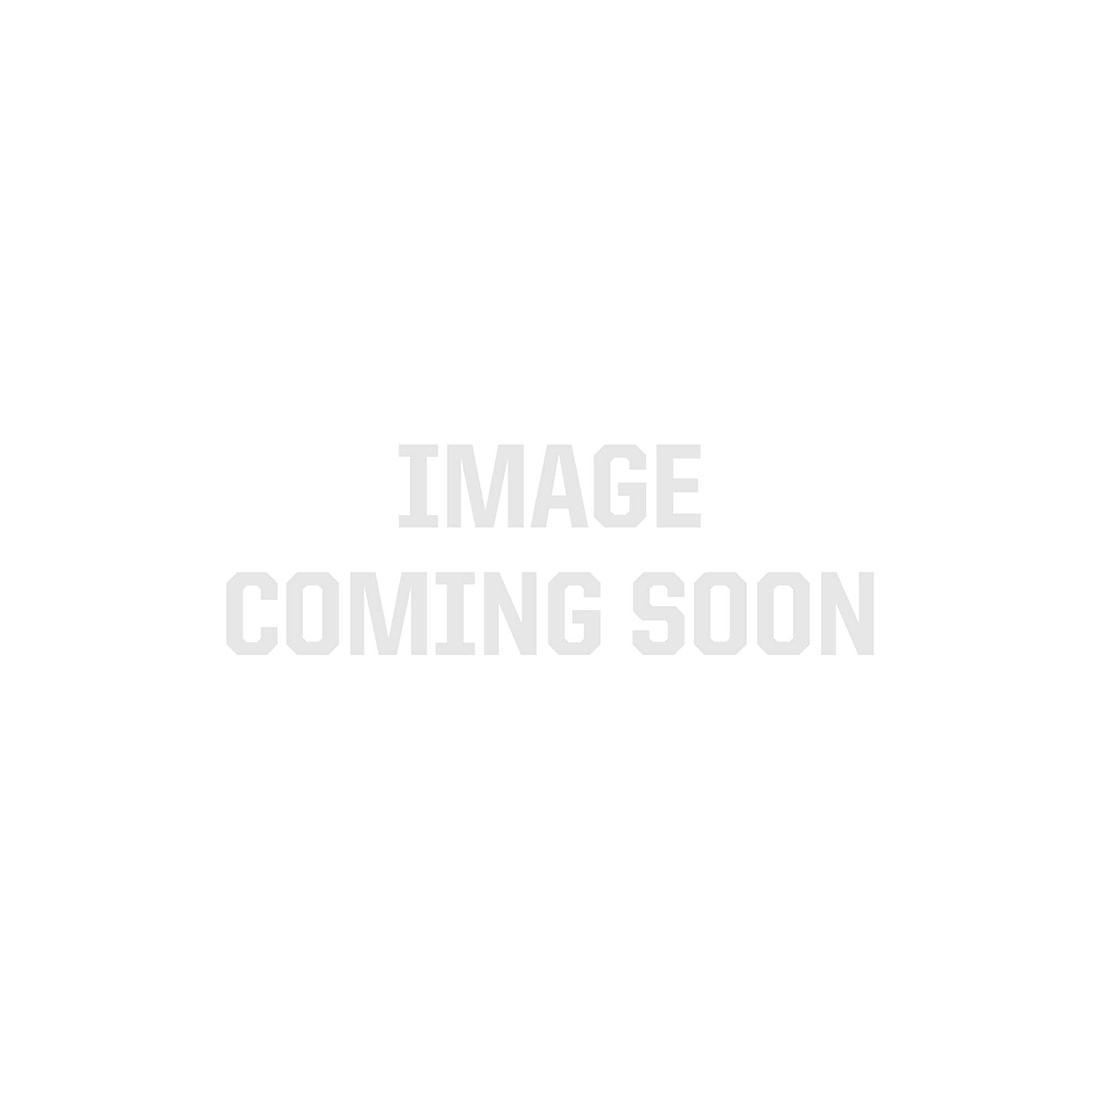 UltraSlim 2016 LED Strip Light - 6,500K - 120/m - Sample Kit